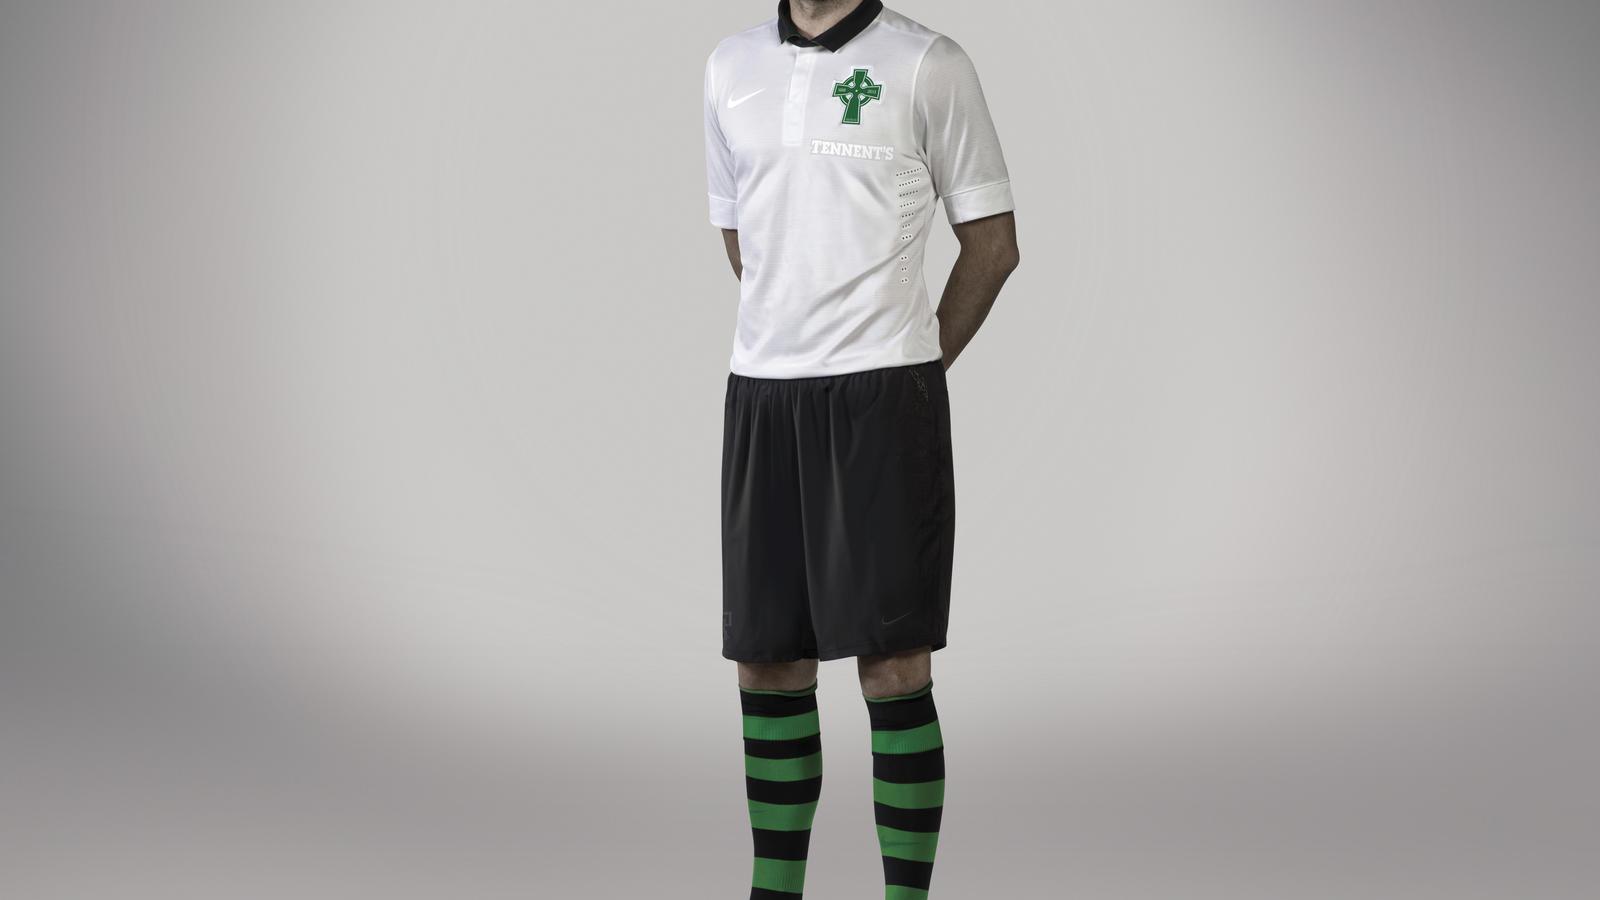 big sale 069bd 5092c Celtic Football Club Launch 125th anniversary kit - Nike News